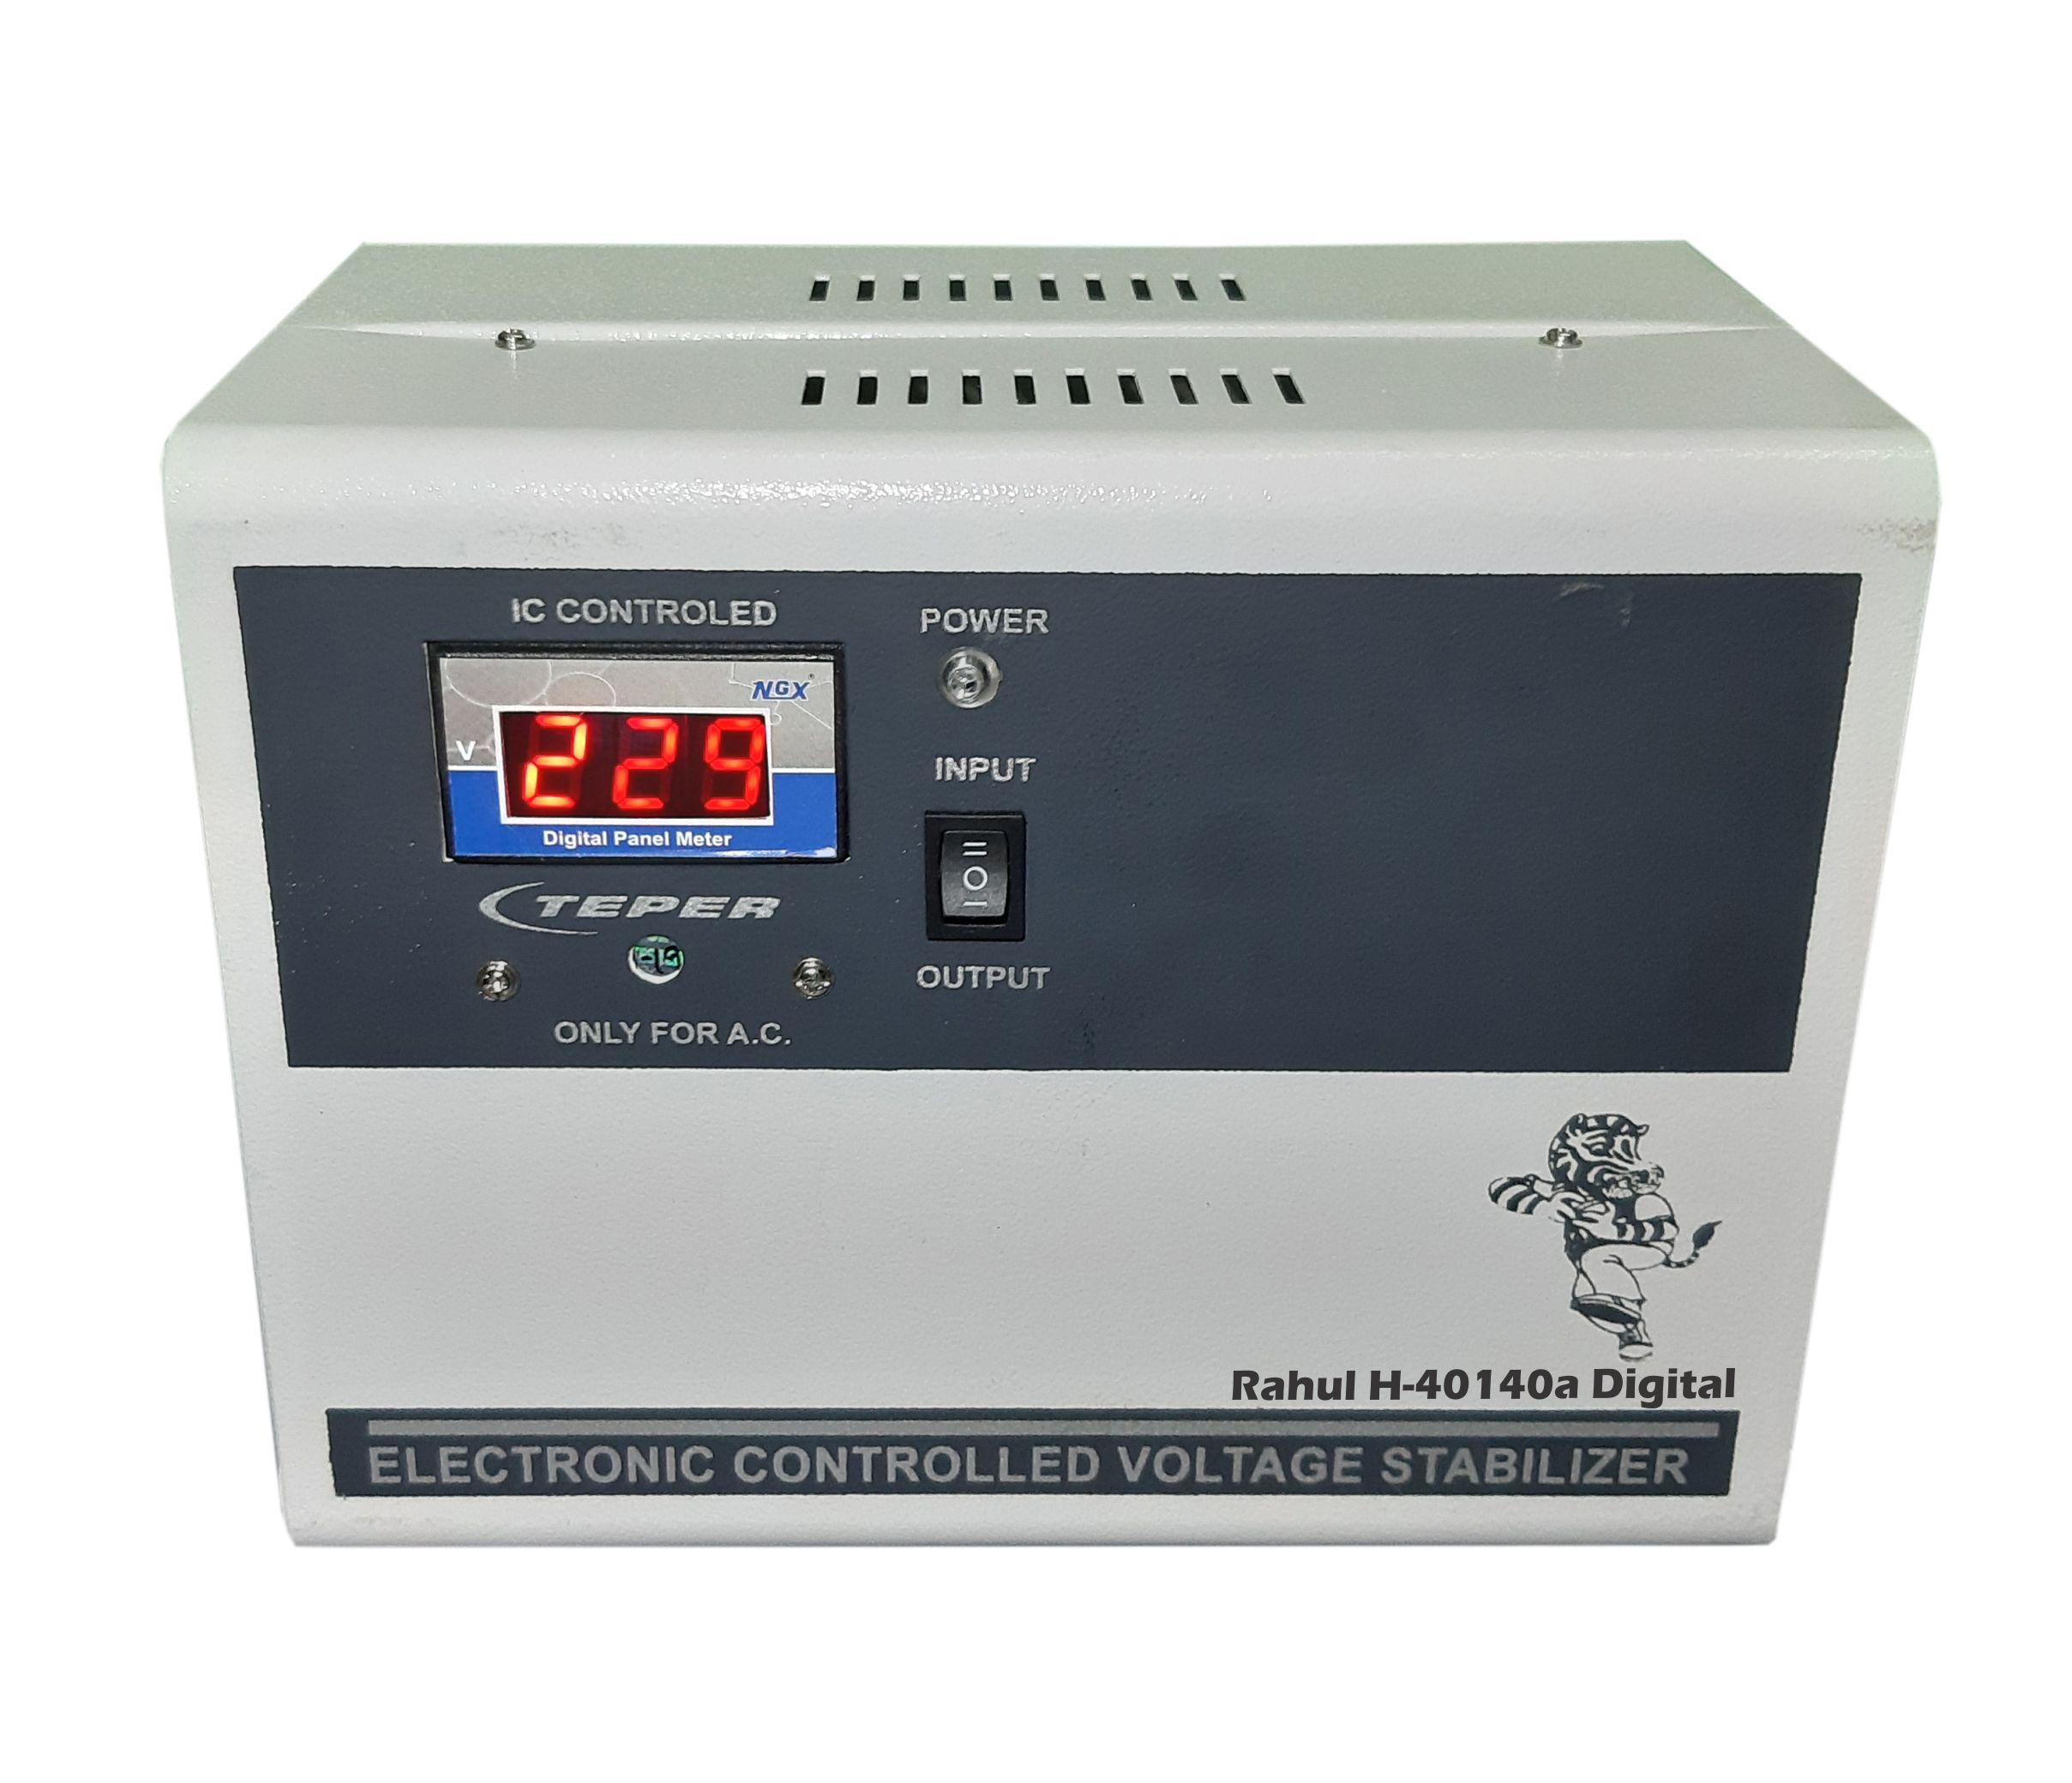 Rahul H 40140a Digital 4 Kva/12 Amp In Put 140 280 Volt 3 Booster Automatic Digital Voltage Stabilizer